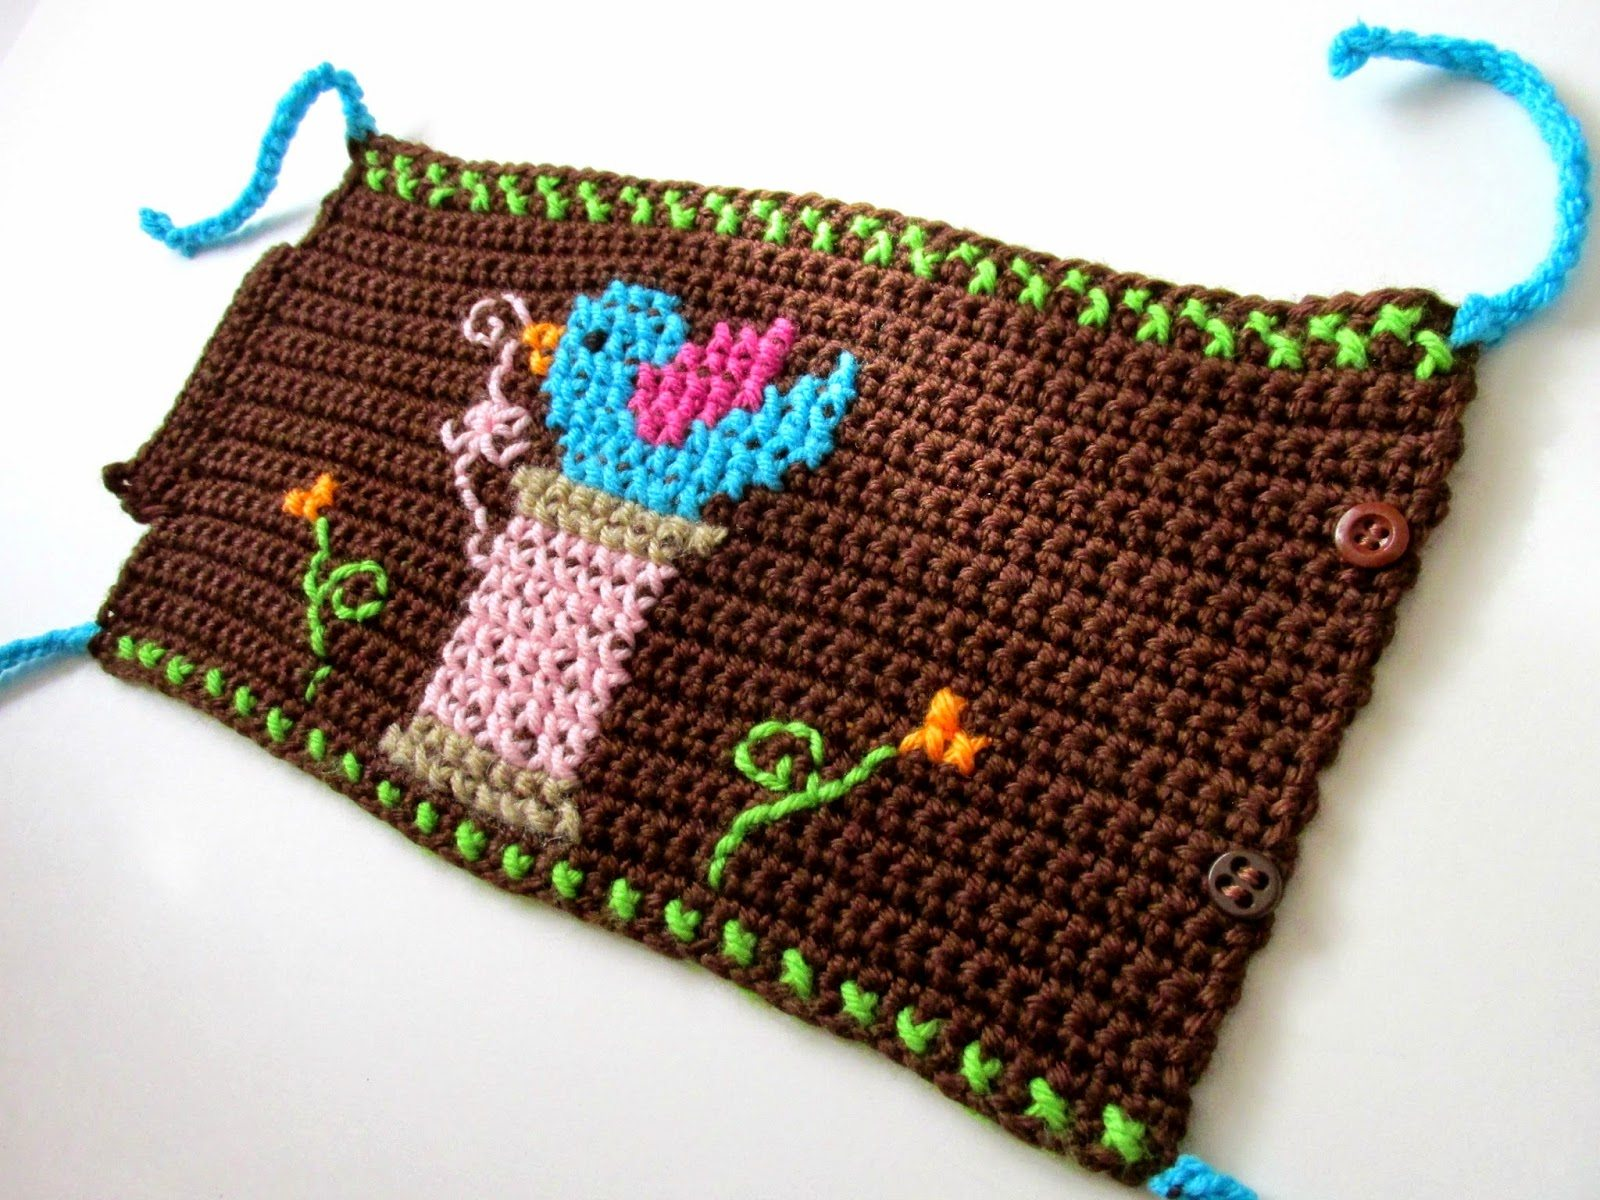 Crochet Koozie : crochet cozy